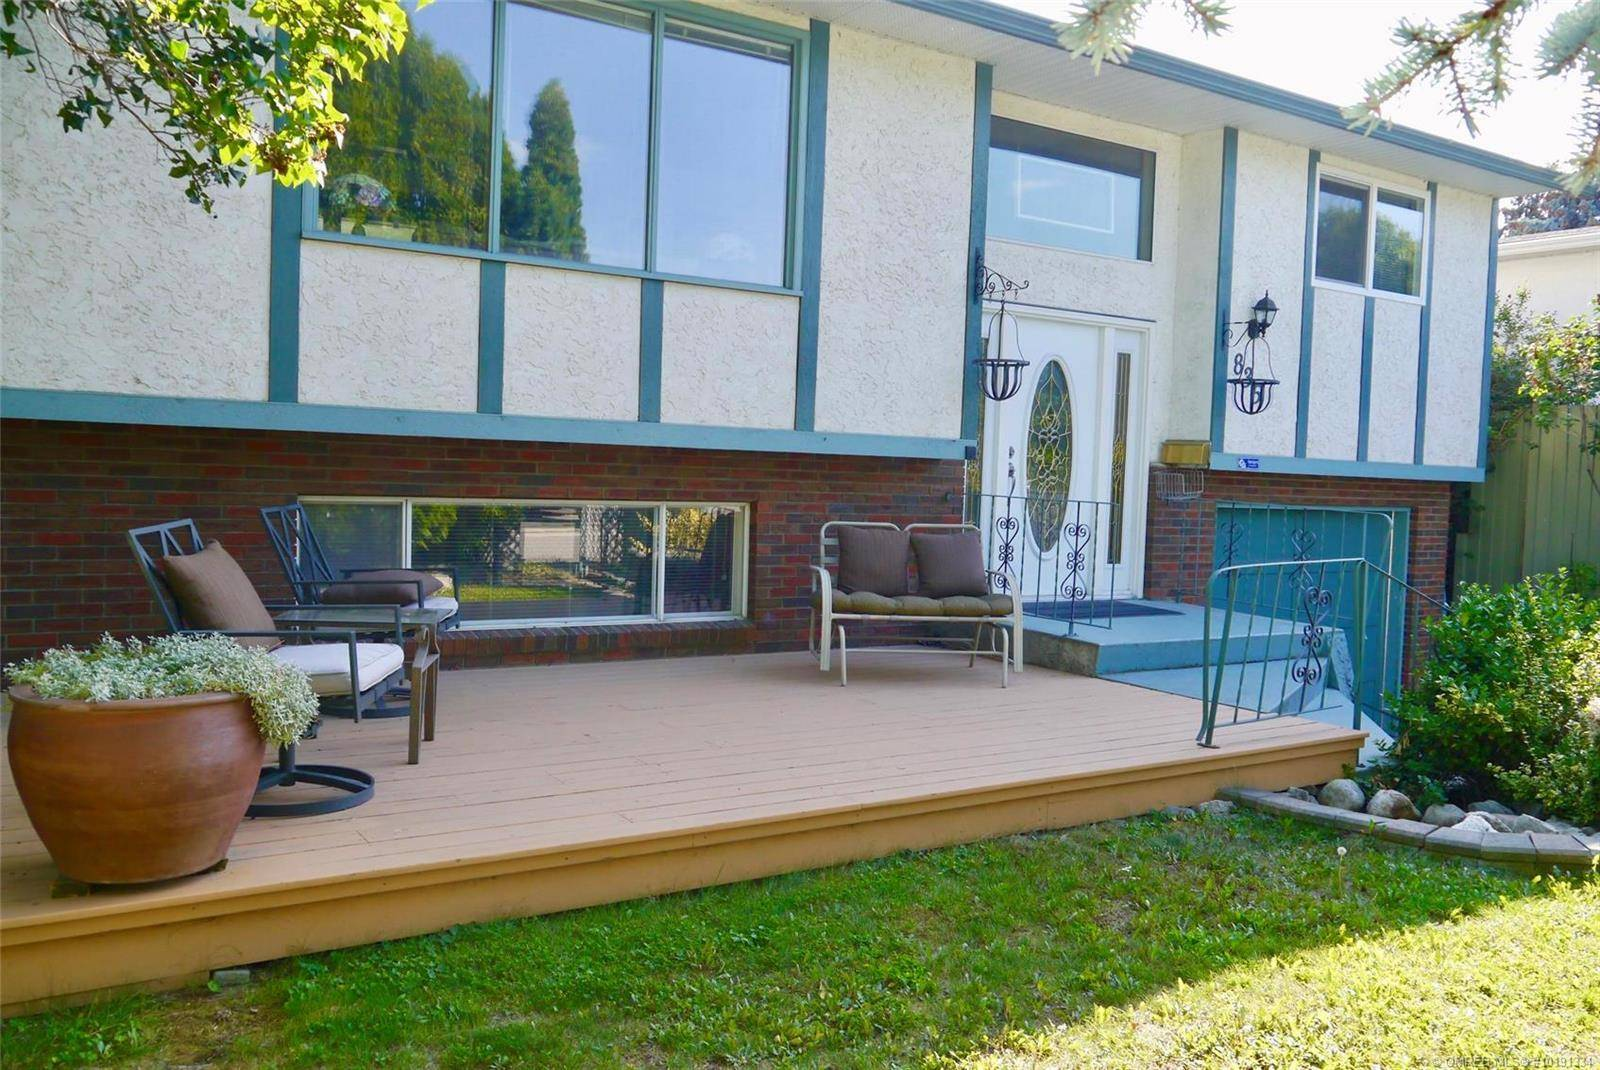 House for sale at 835 Kinnear Ct Kelowna British Columbia - MLS: 10191334